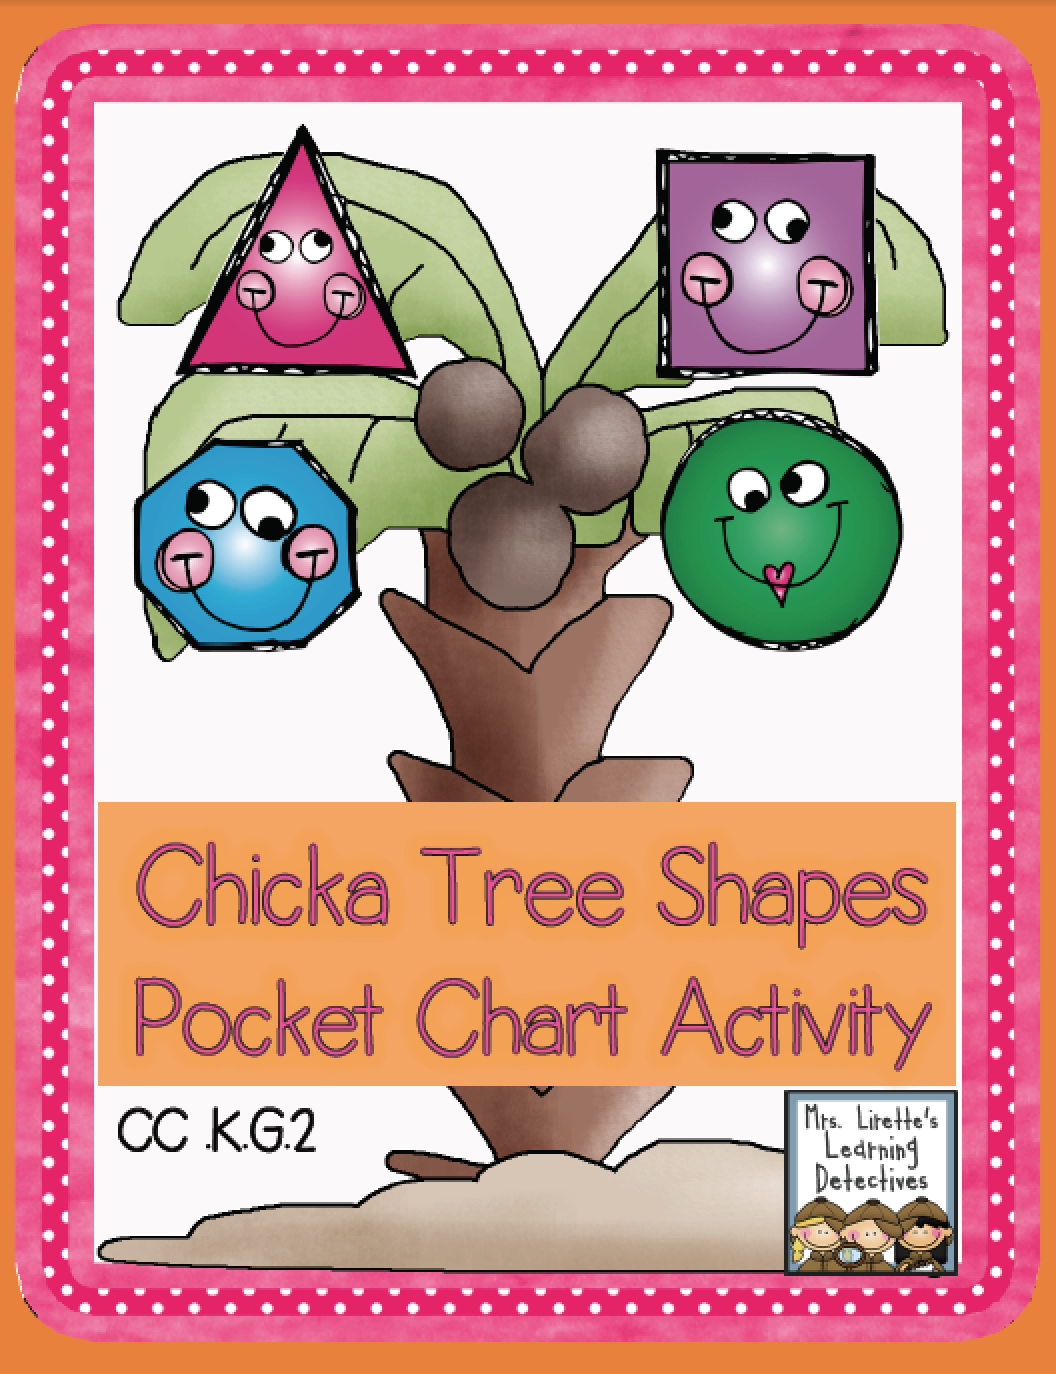 Chicka Tree Shapes Free Pocket Chart Activity With